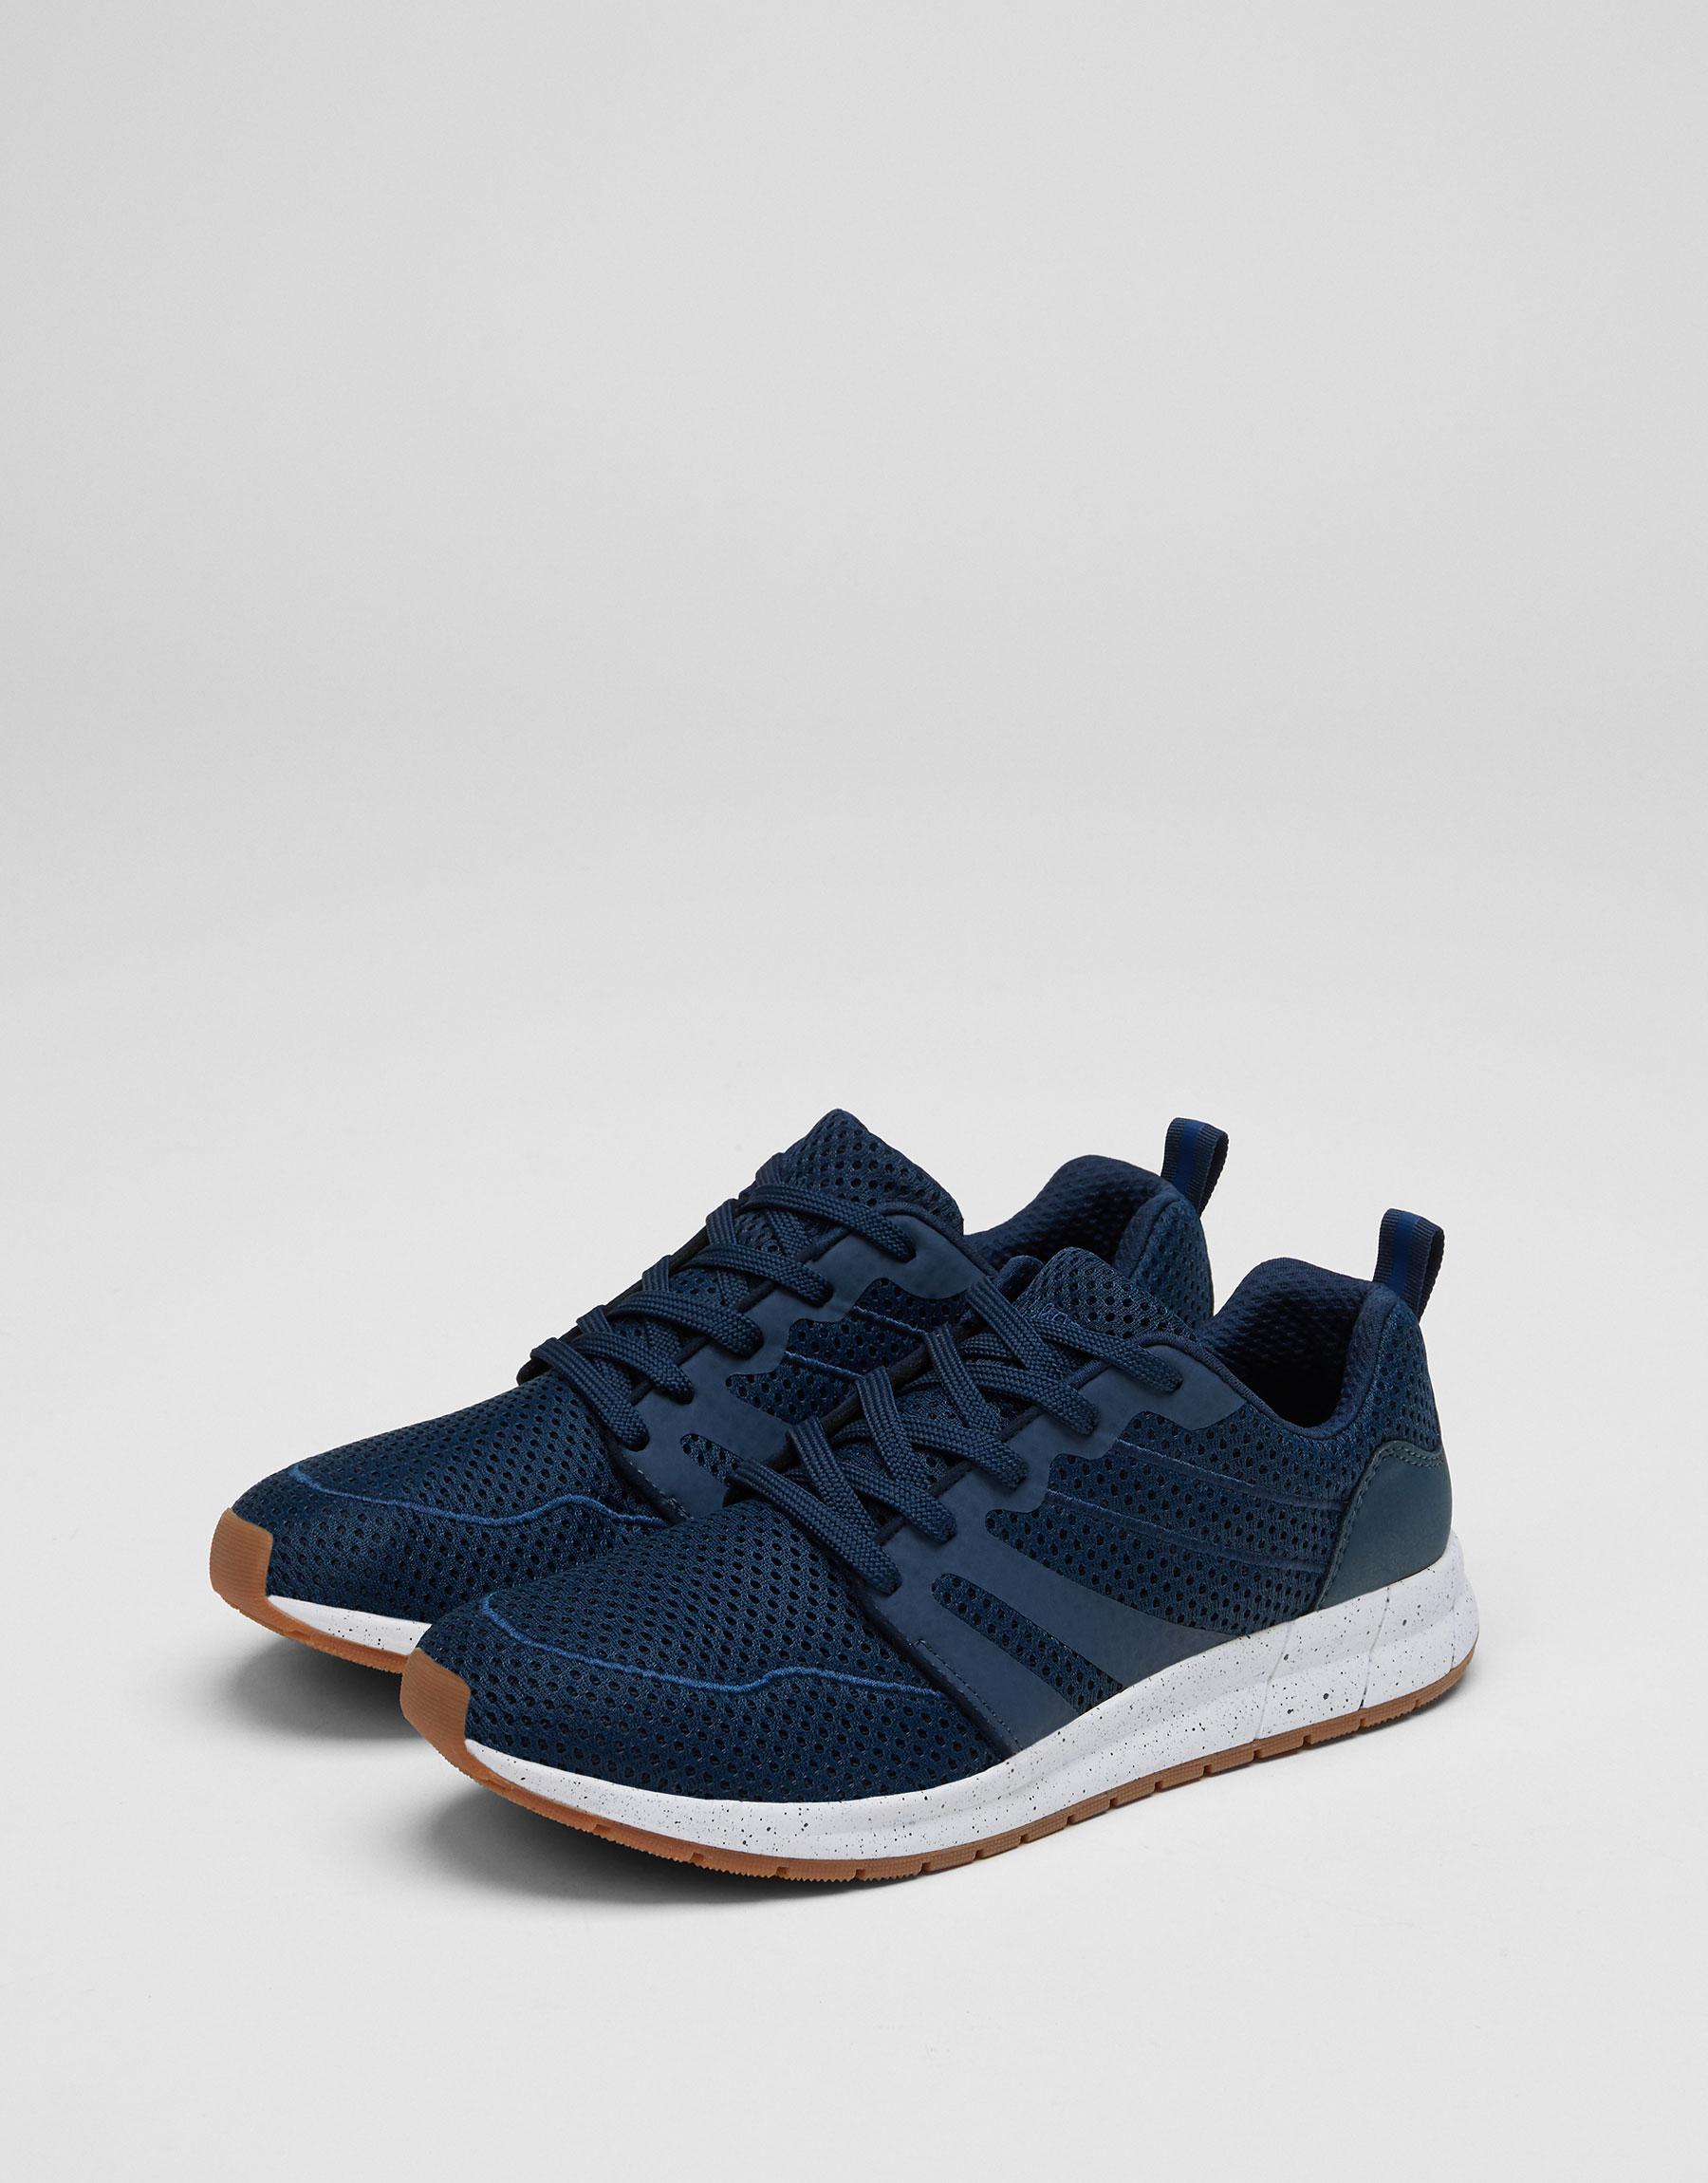 Retro mesh sneakers